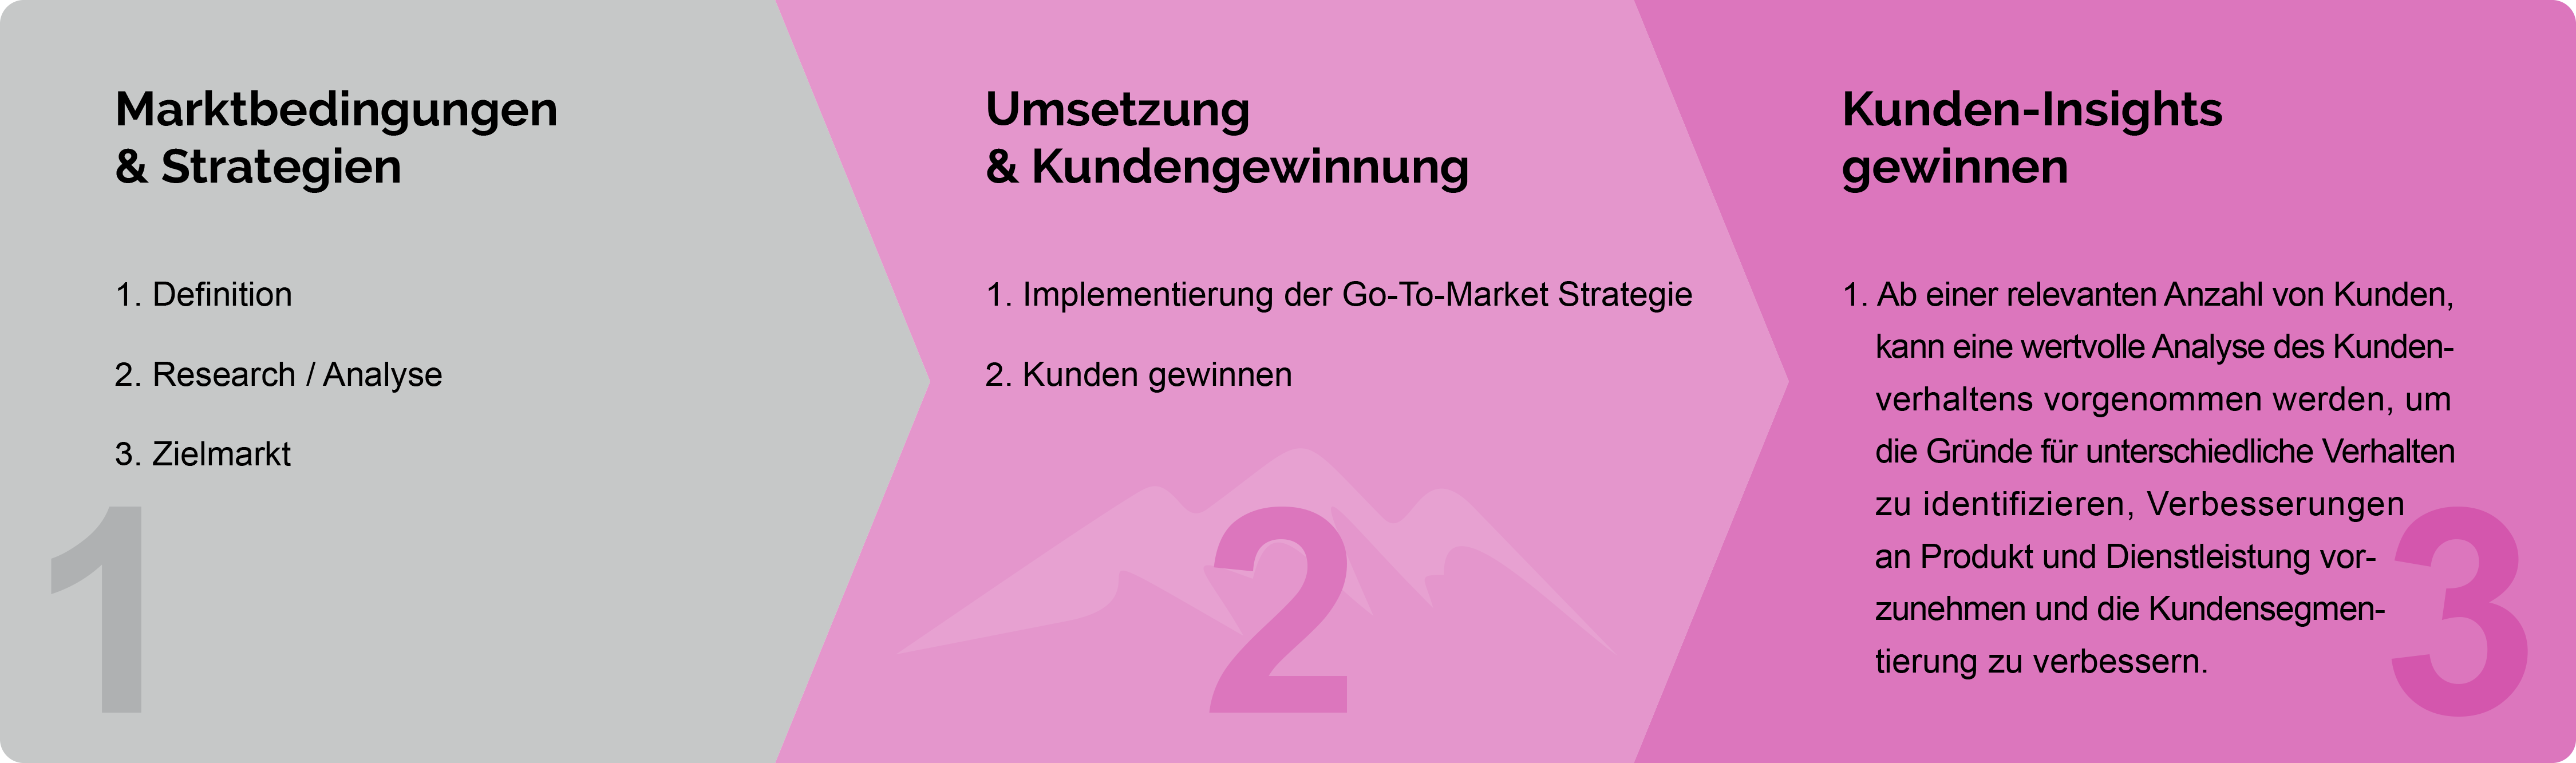 SUMMITIZE Go-To-Market 3-Phasen-Modell